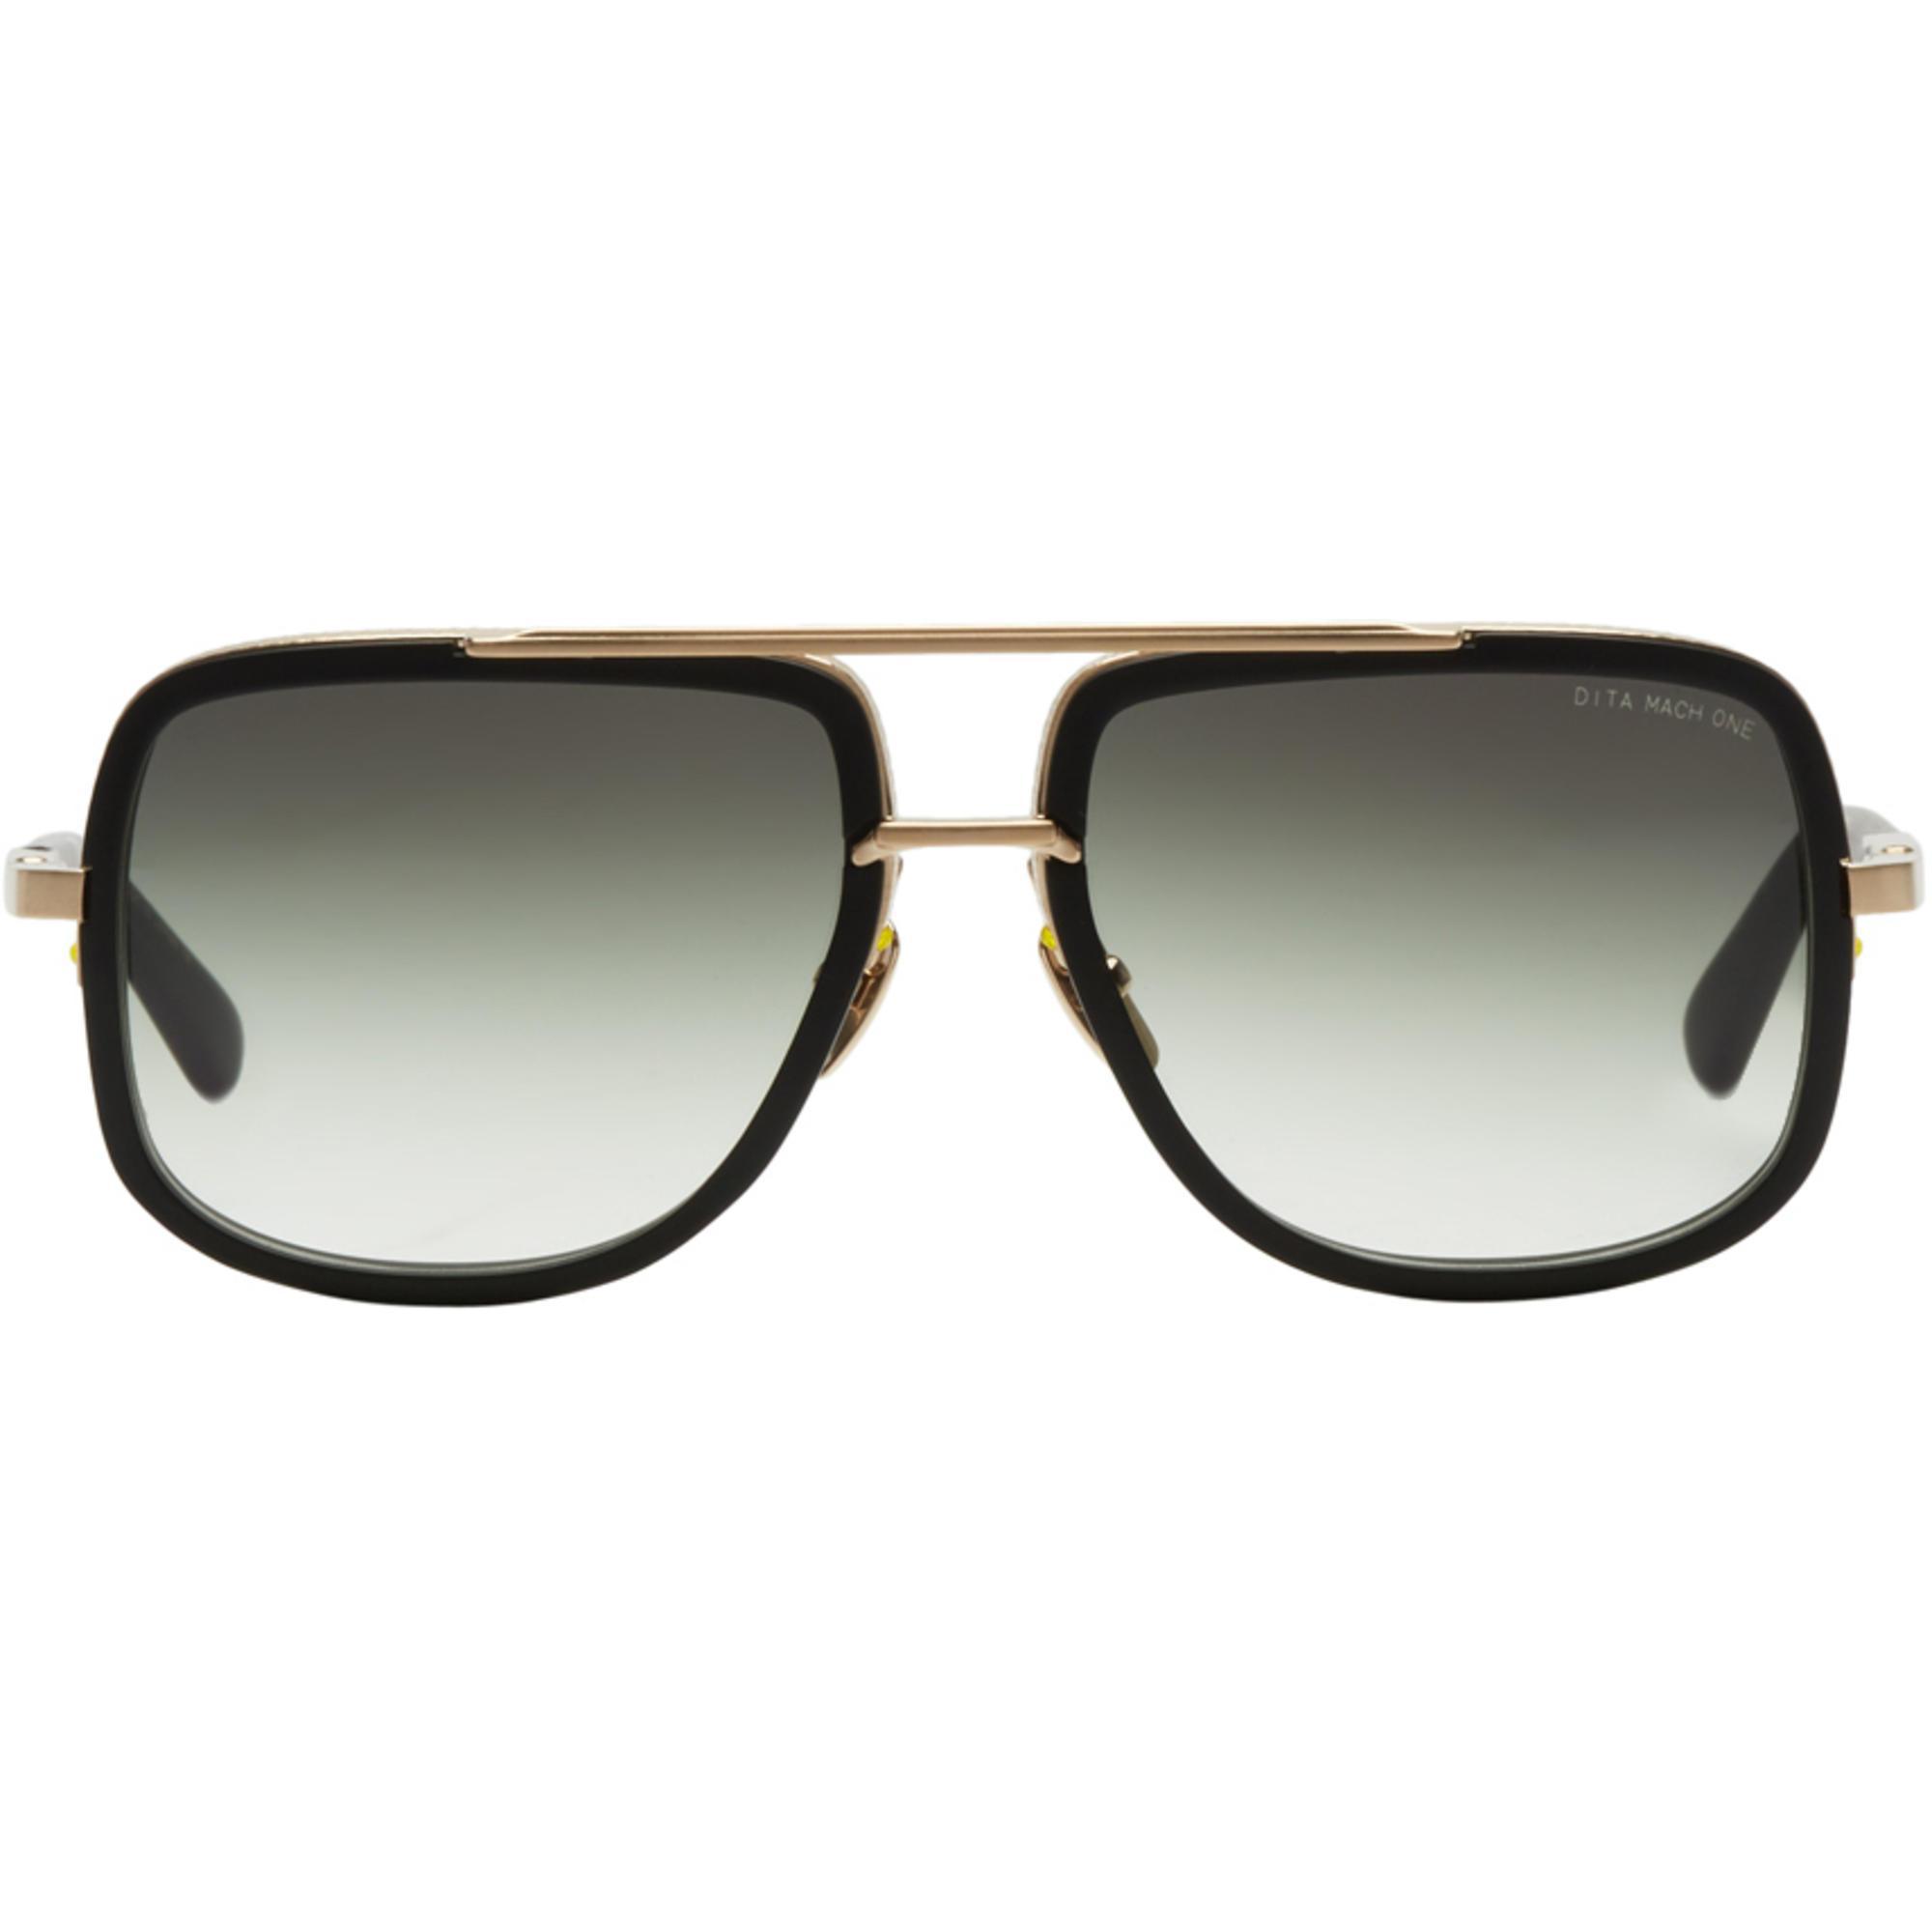 9af4a449e056 DITA Black And Gold Mach One Sunglasses in Black for Men - Lyst